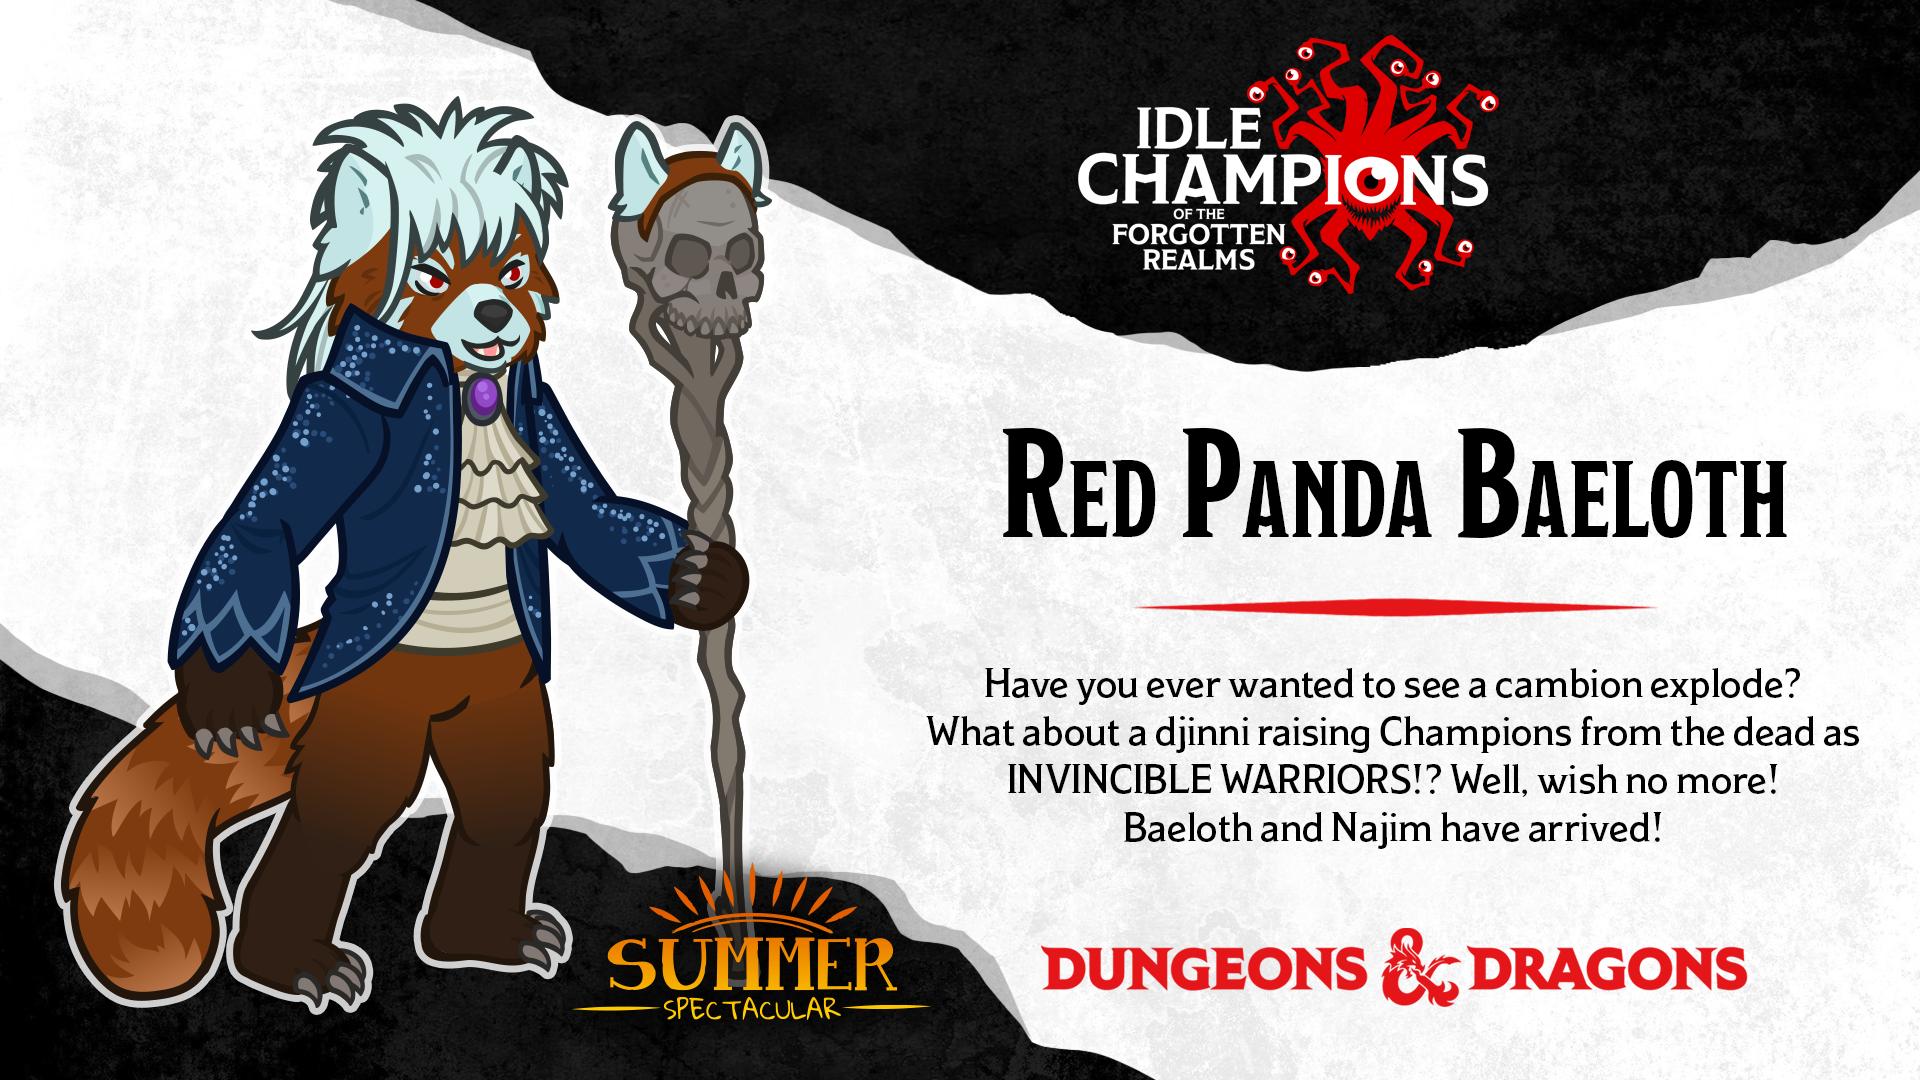 Dungeons & Dragons Summer Spectacular New DLC